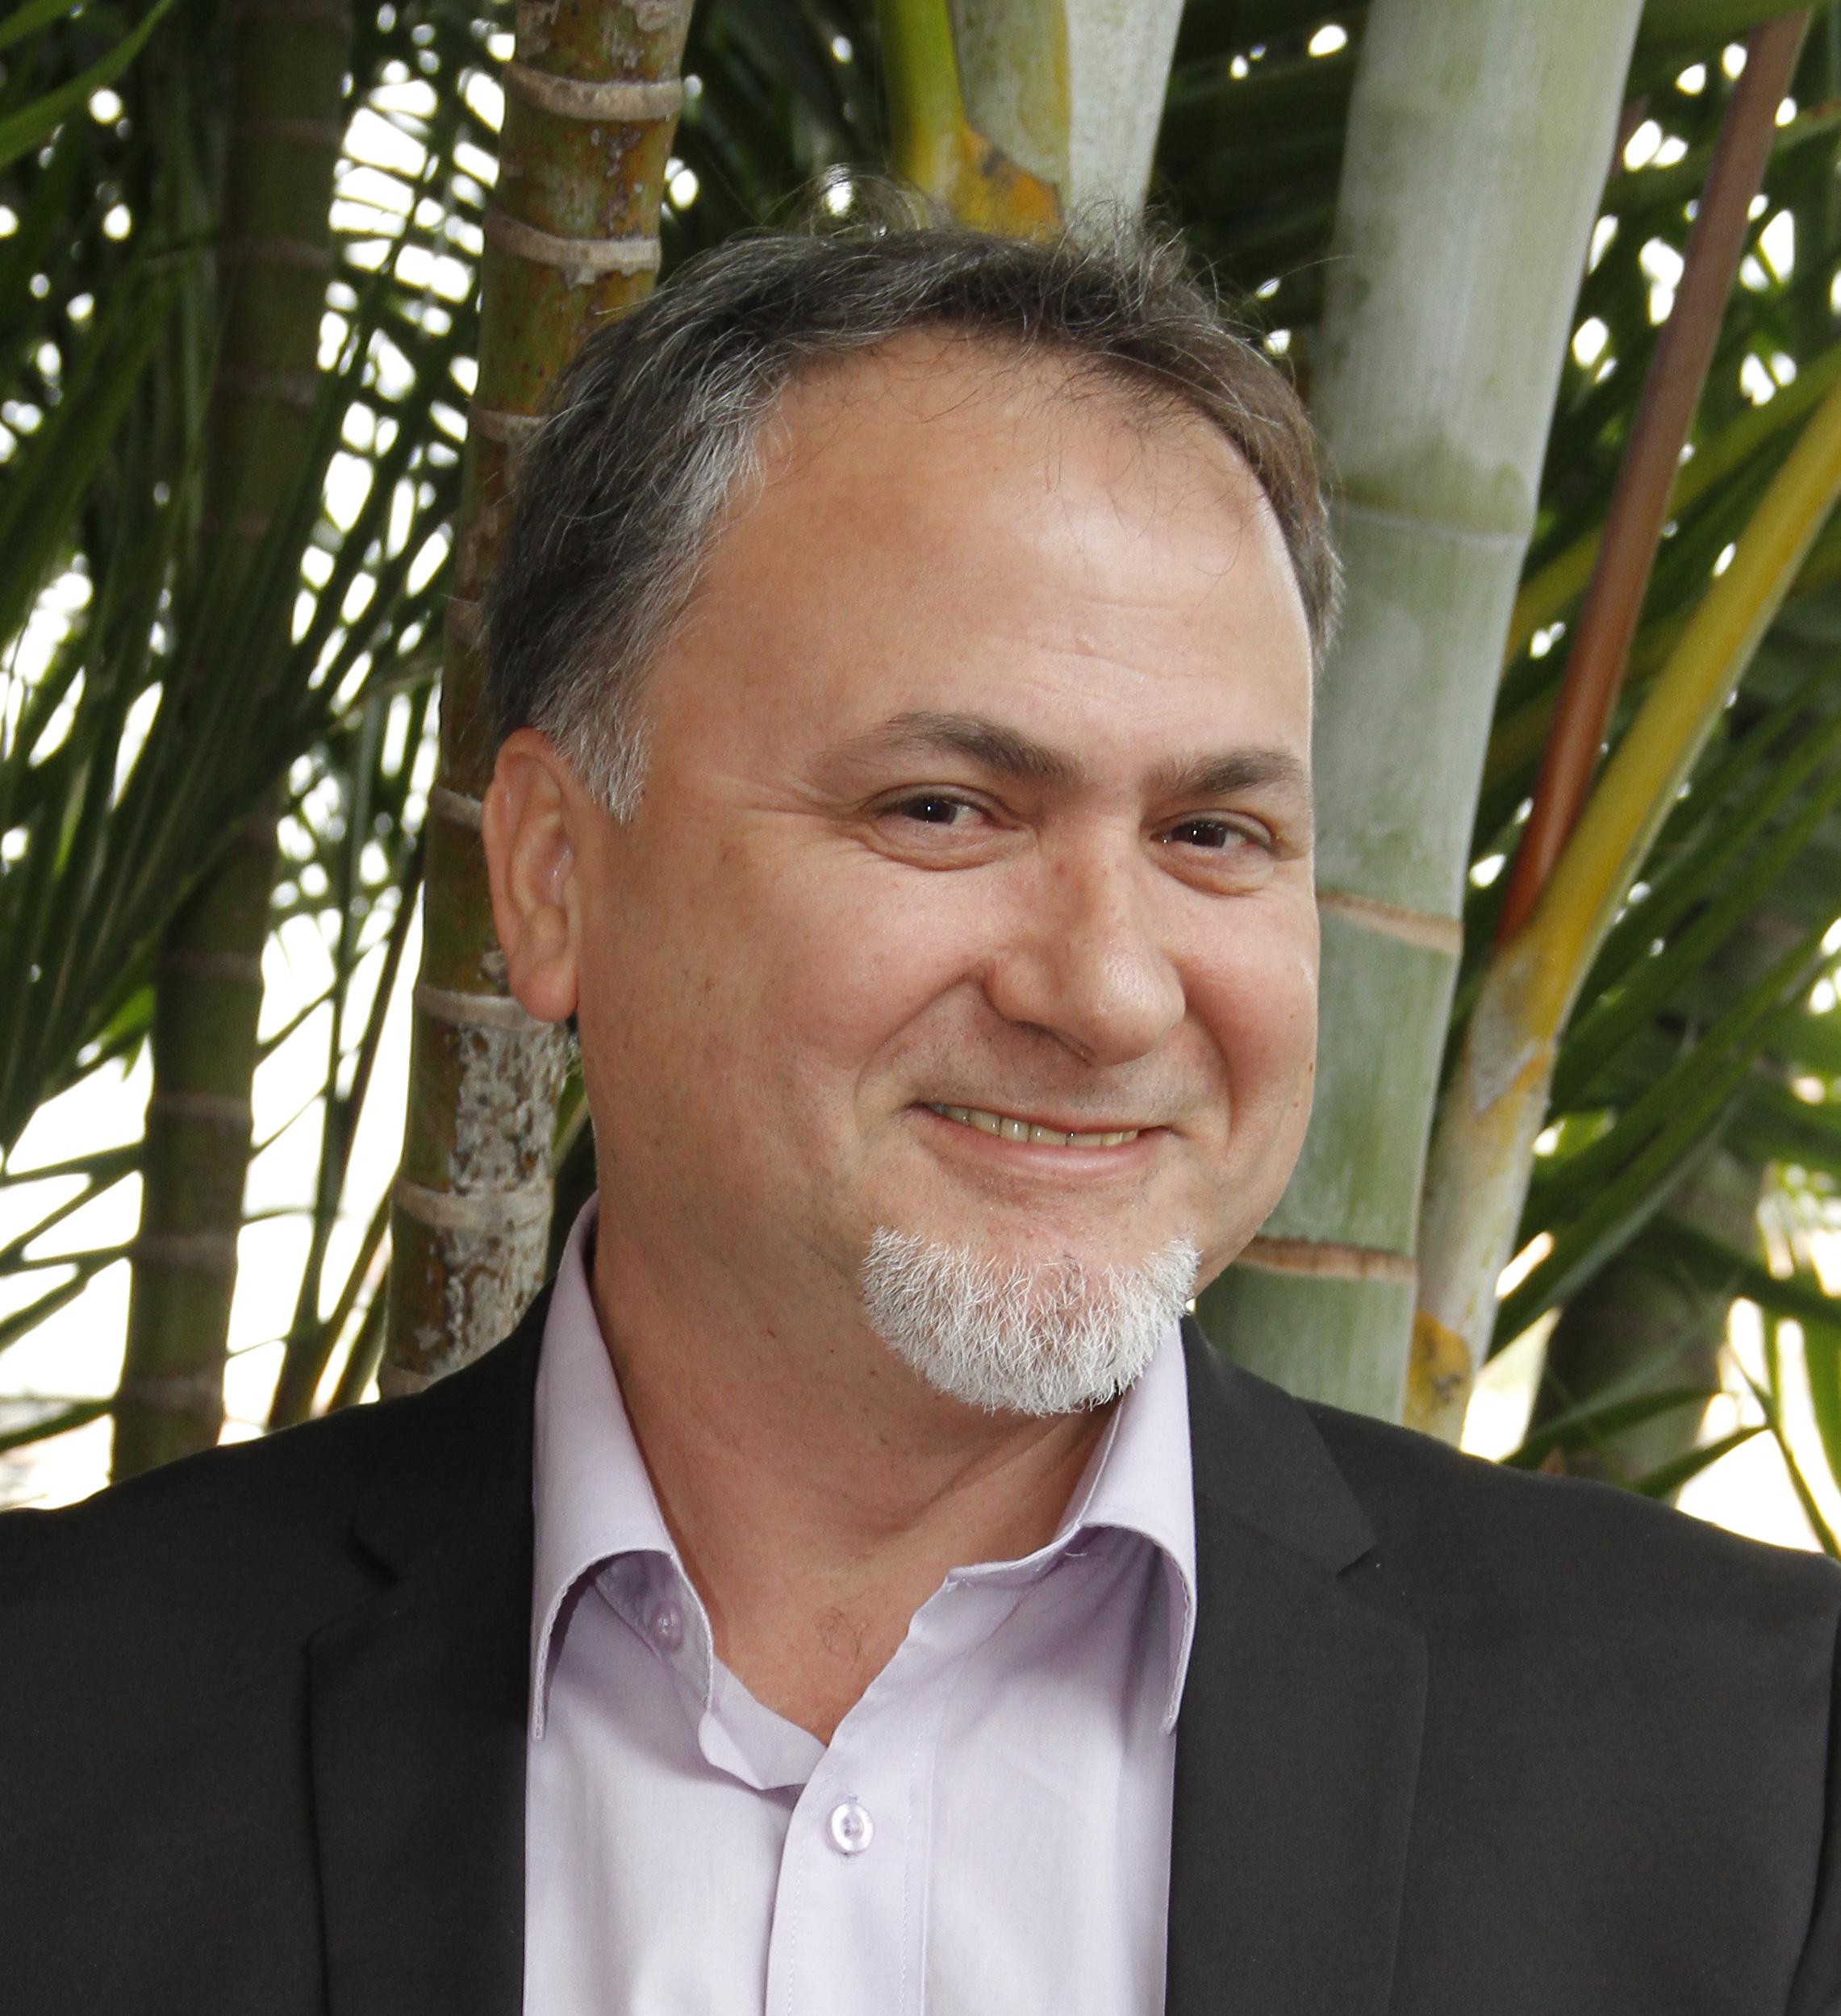 Fotógrafo Profissional Paulo Matheus